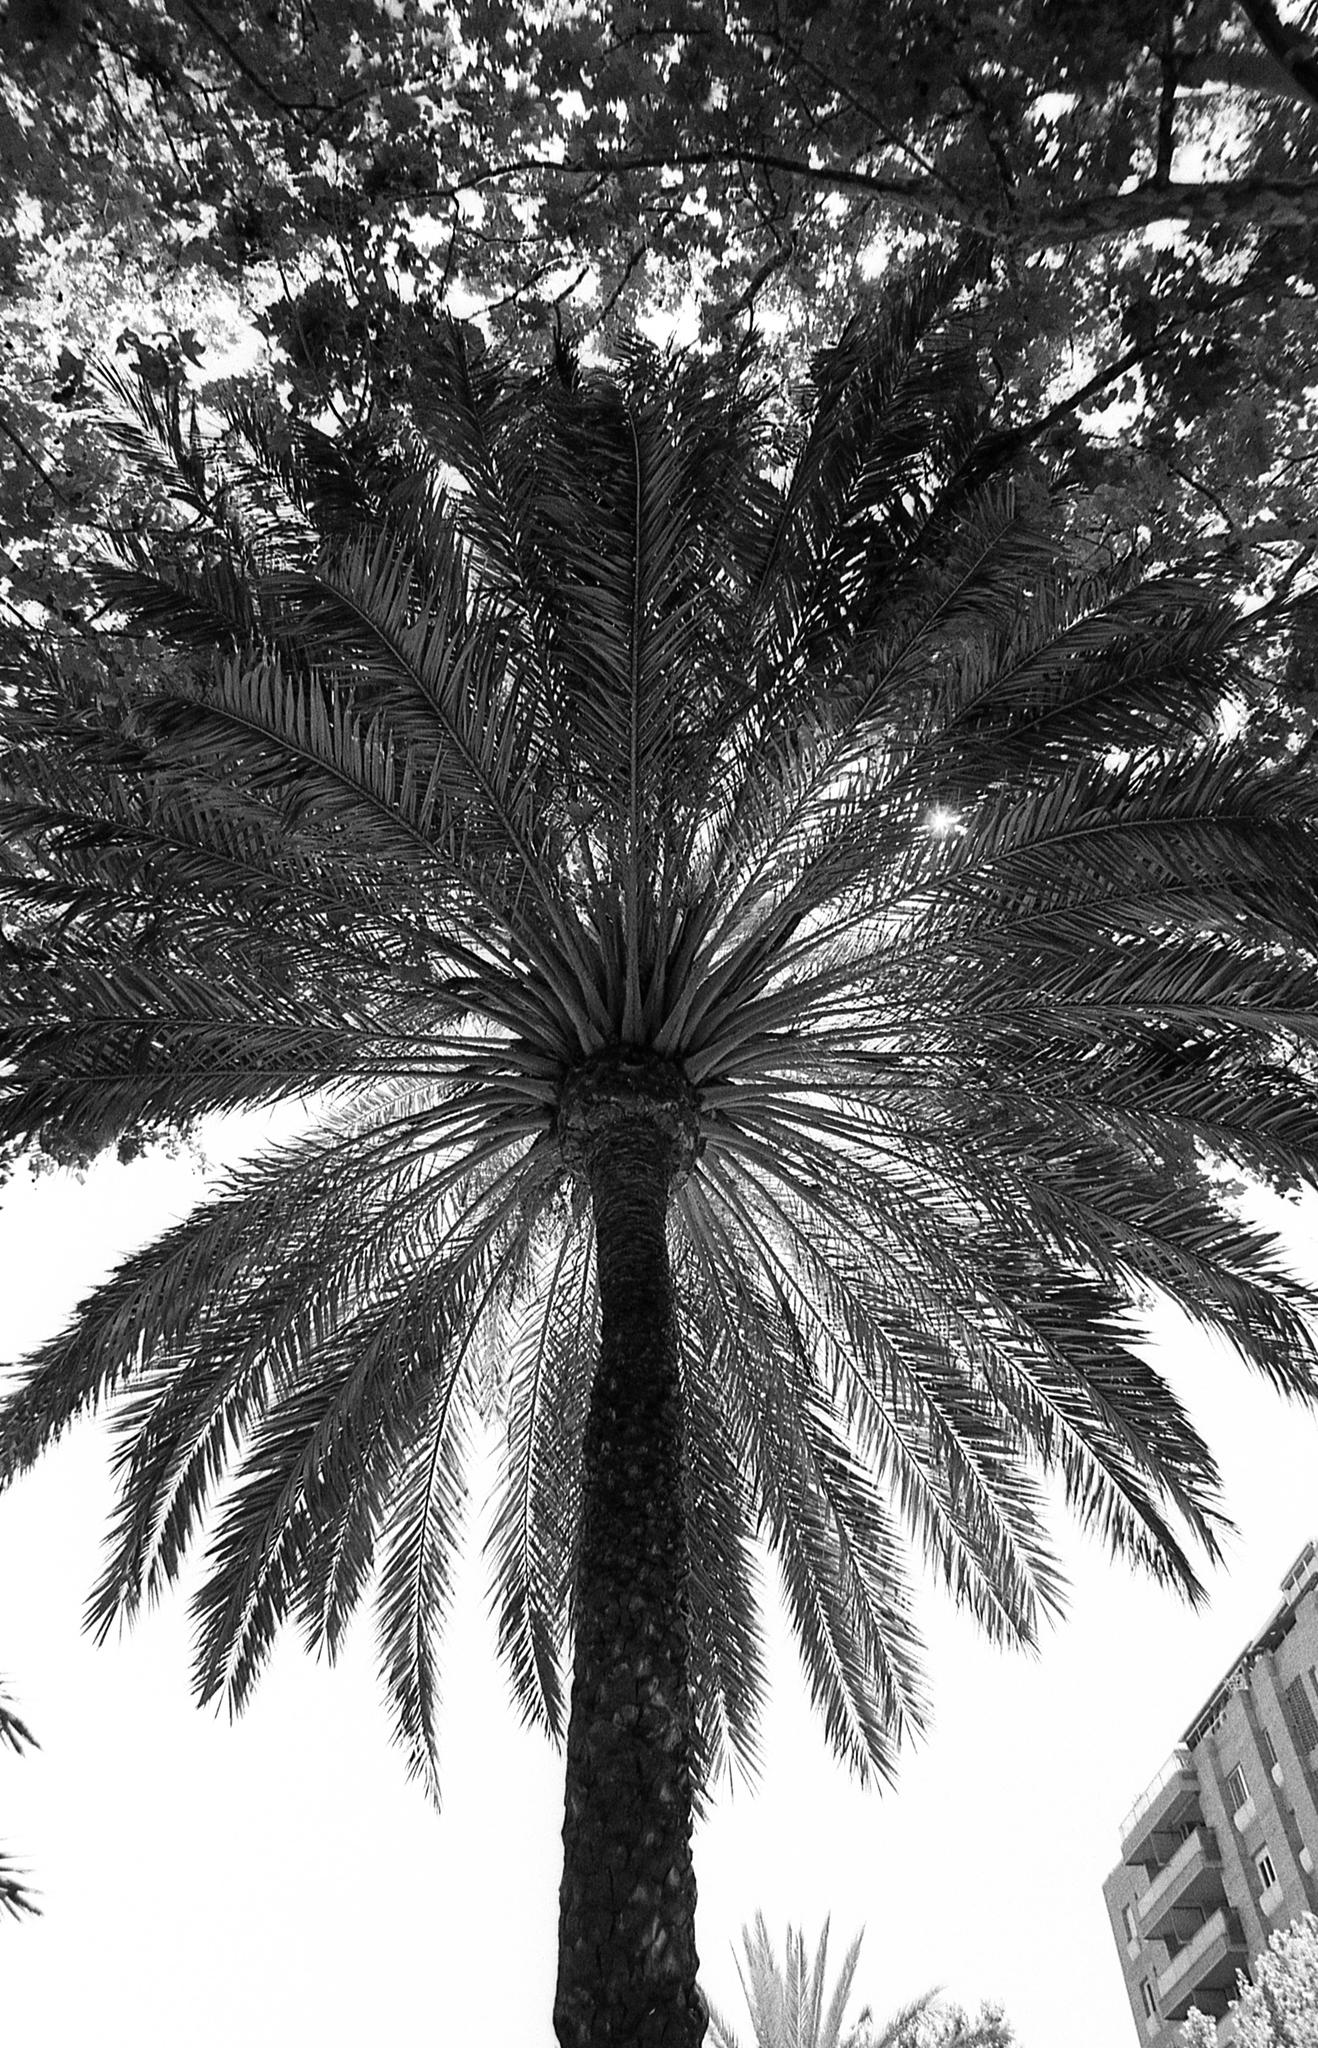 Фотопленка Silberra ULTIMA 100, 35 мм, 36 кадров, ч/б